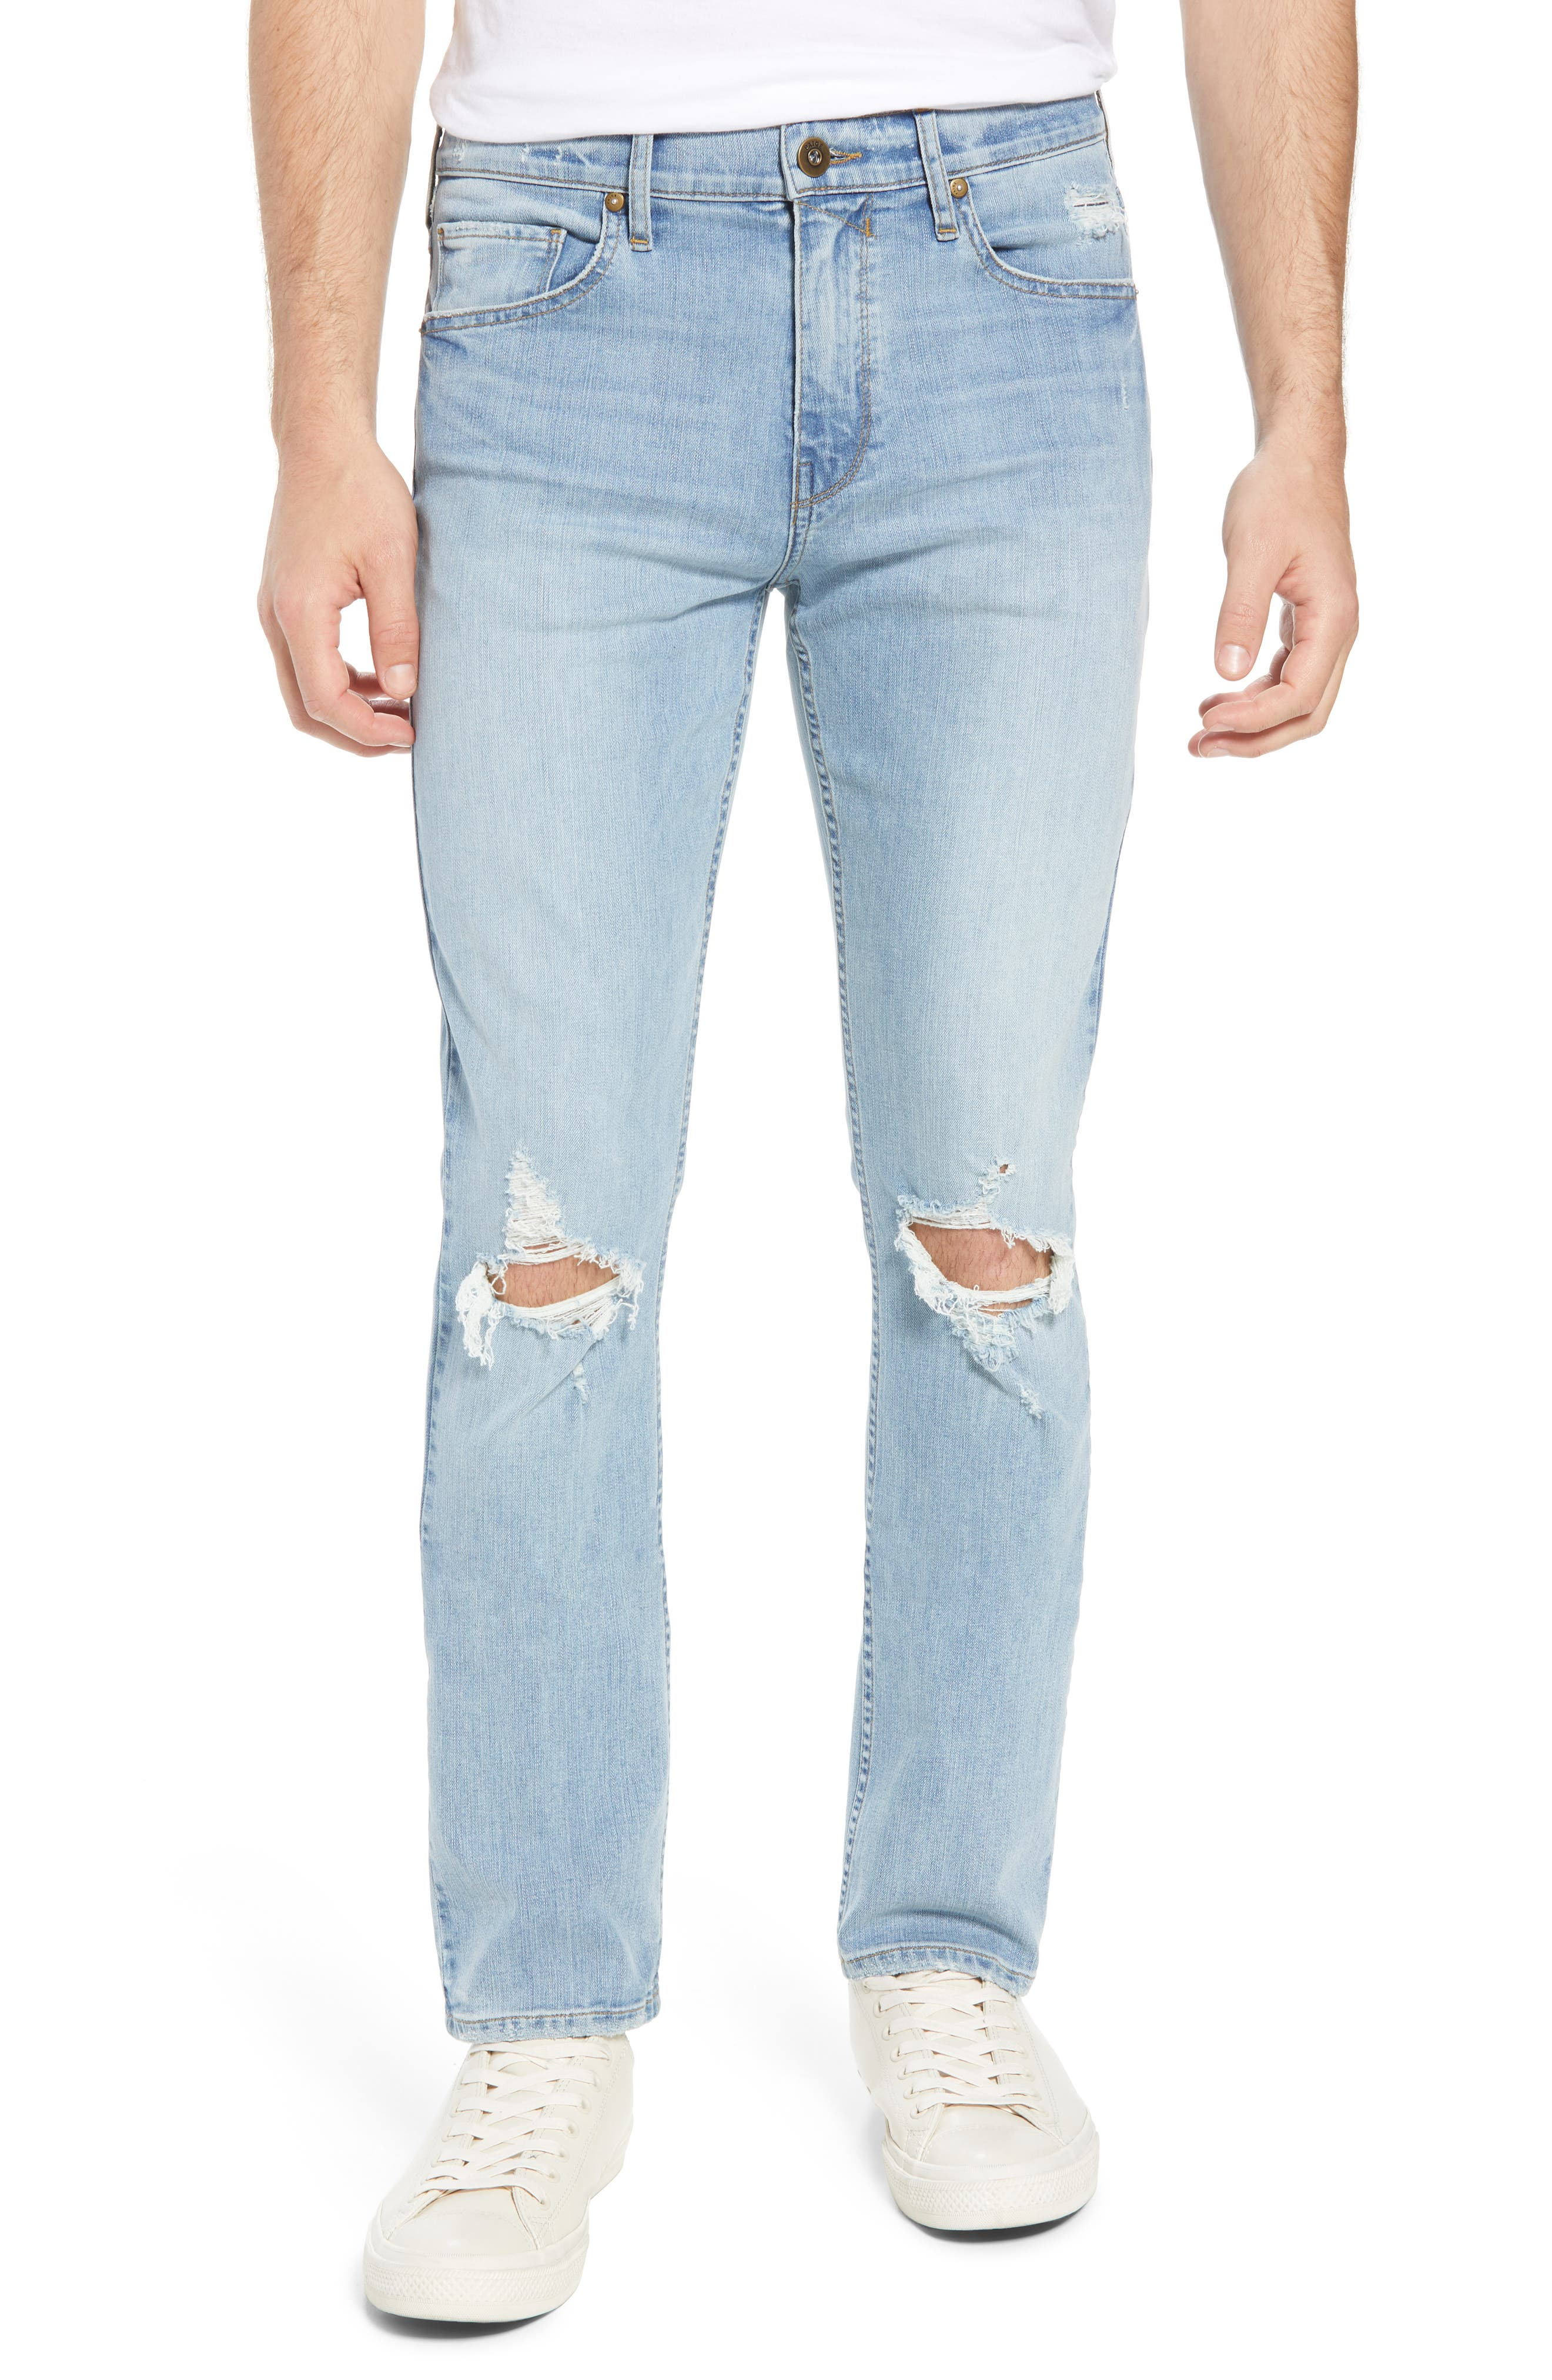 Lennox Slim Fit Jeans,                         Main,                         color, County Destructed